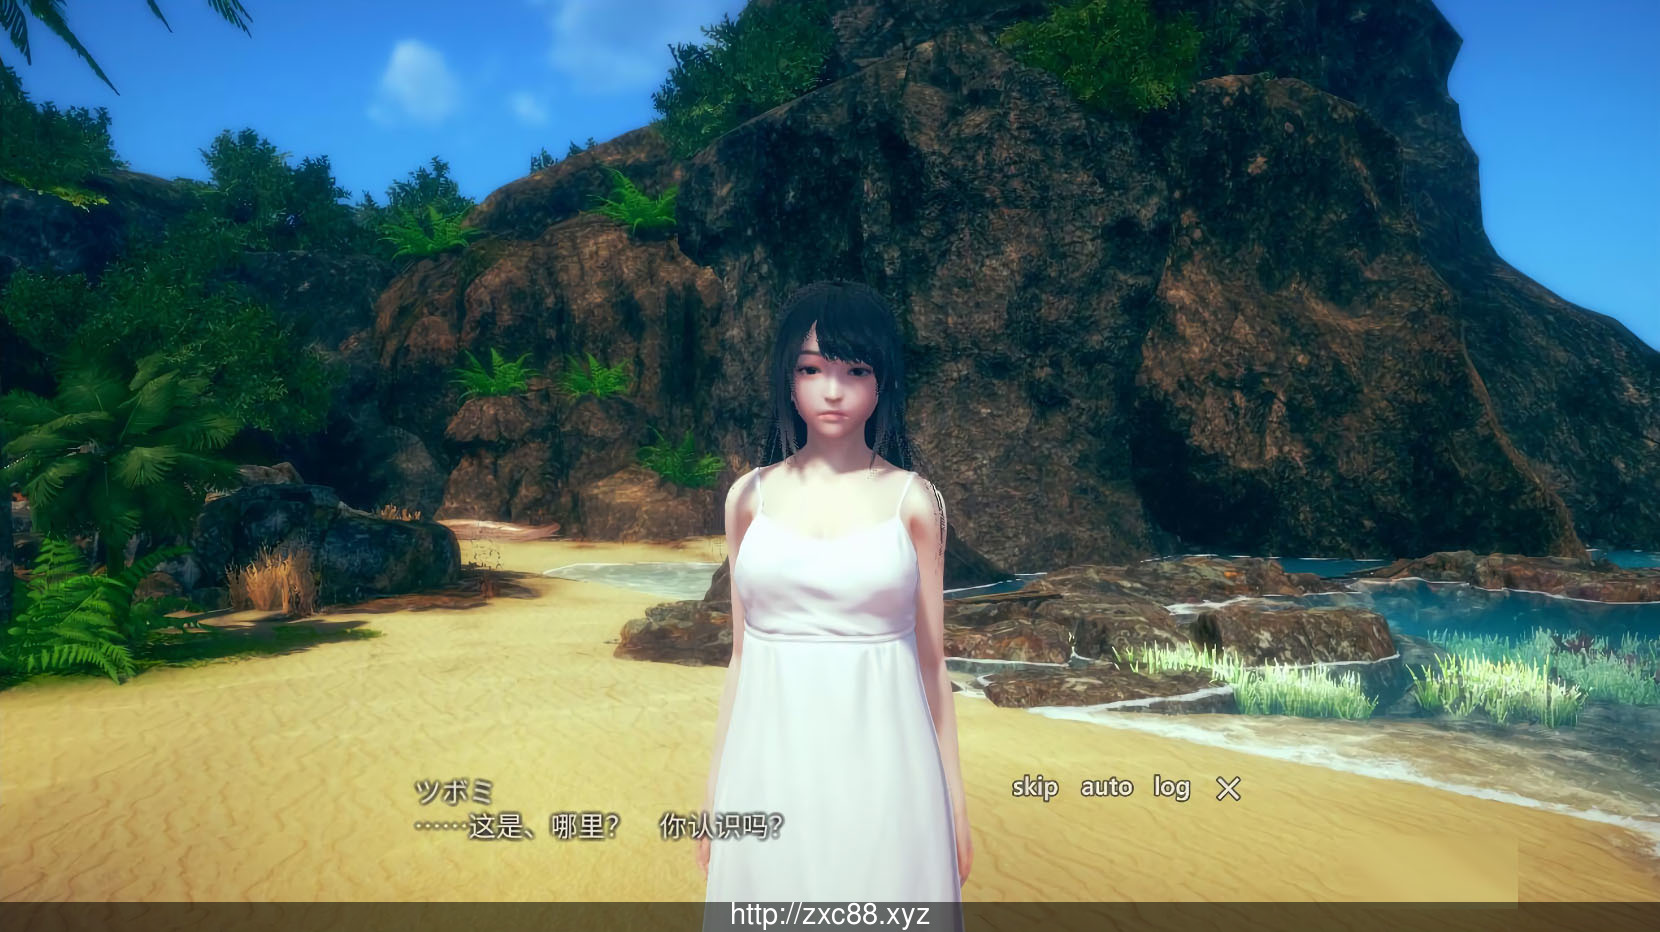 【3D巨作/I社/汉化】AI少女:ZODGAME简体中文Ver1.11 精修完整汉